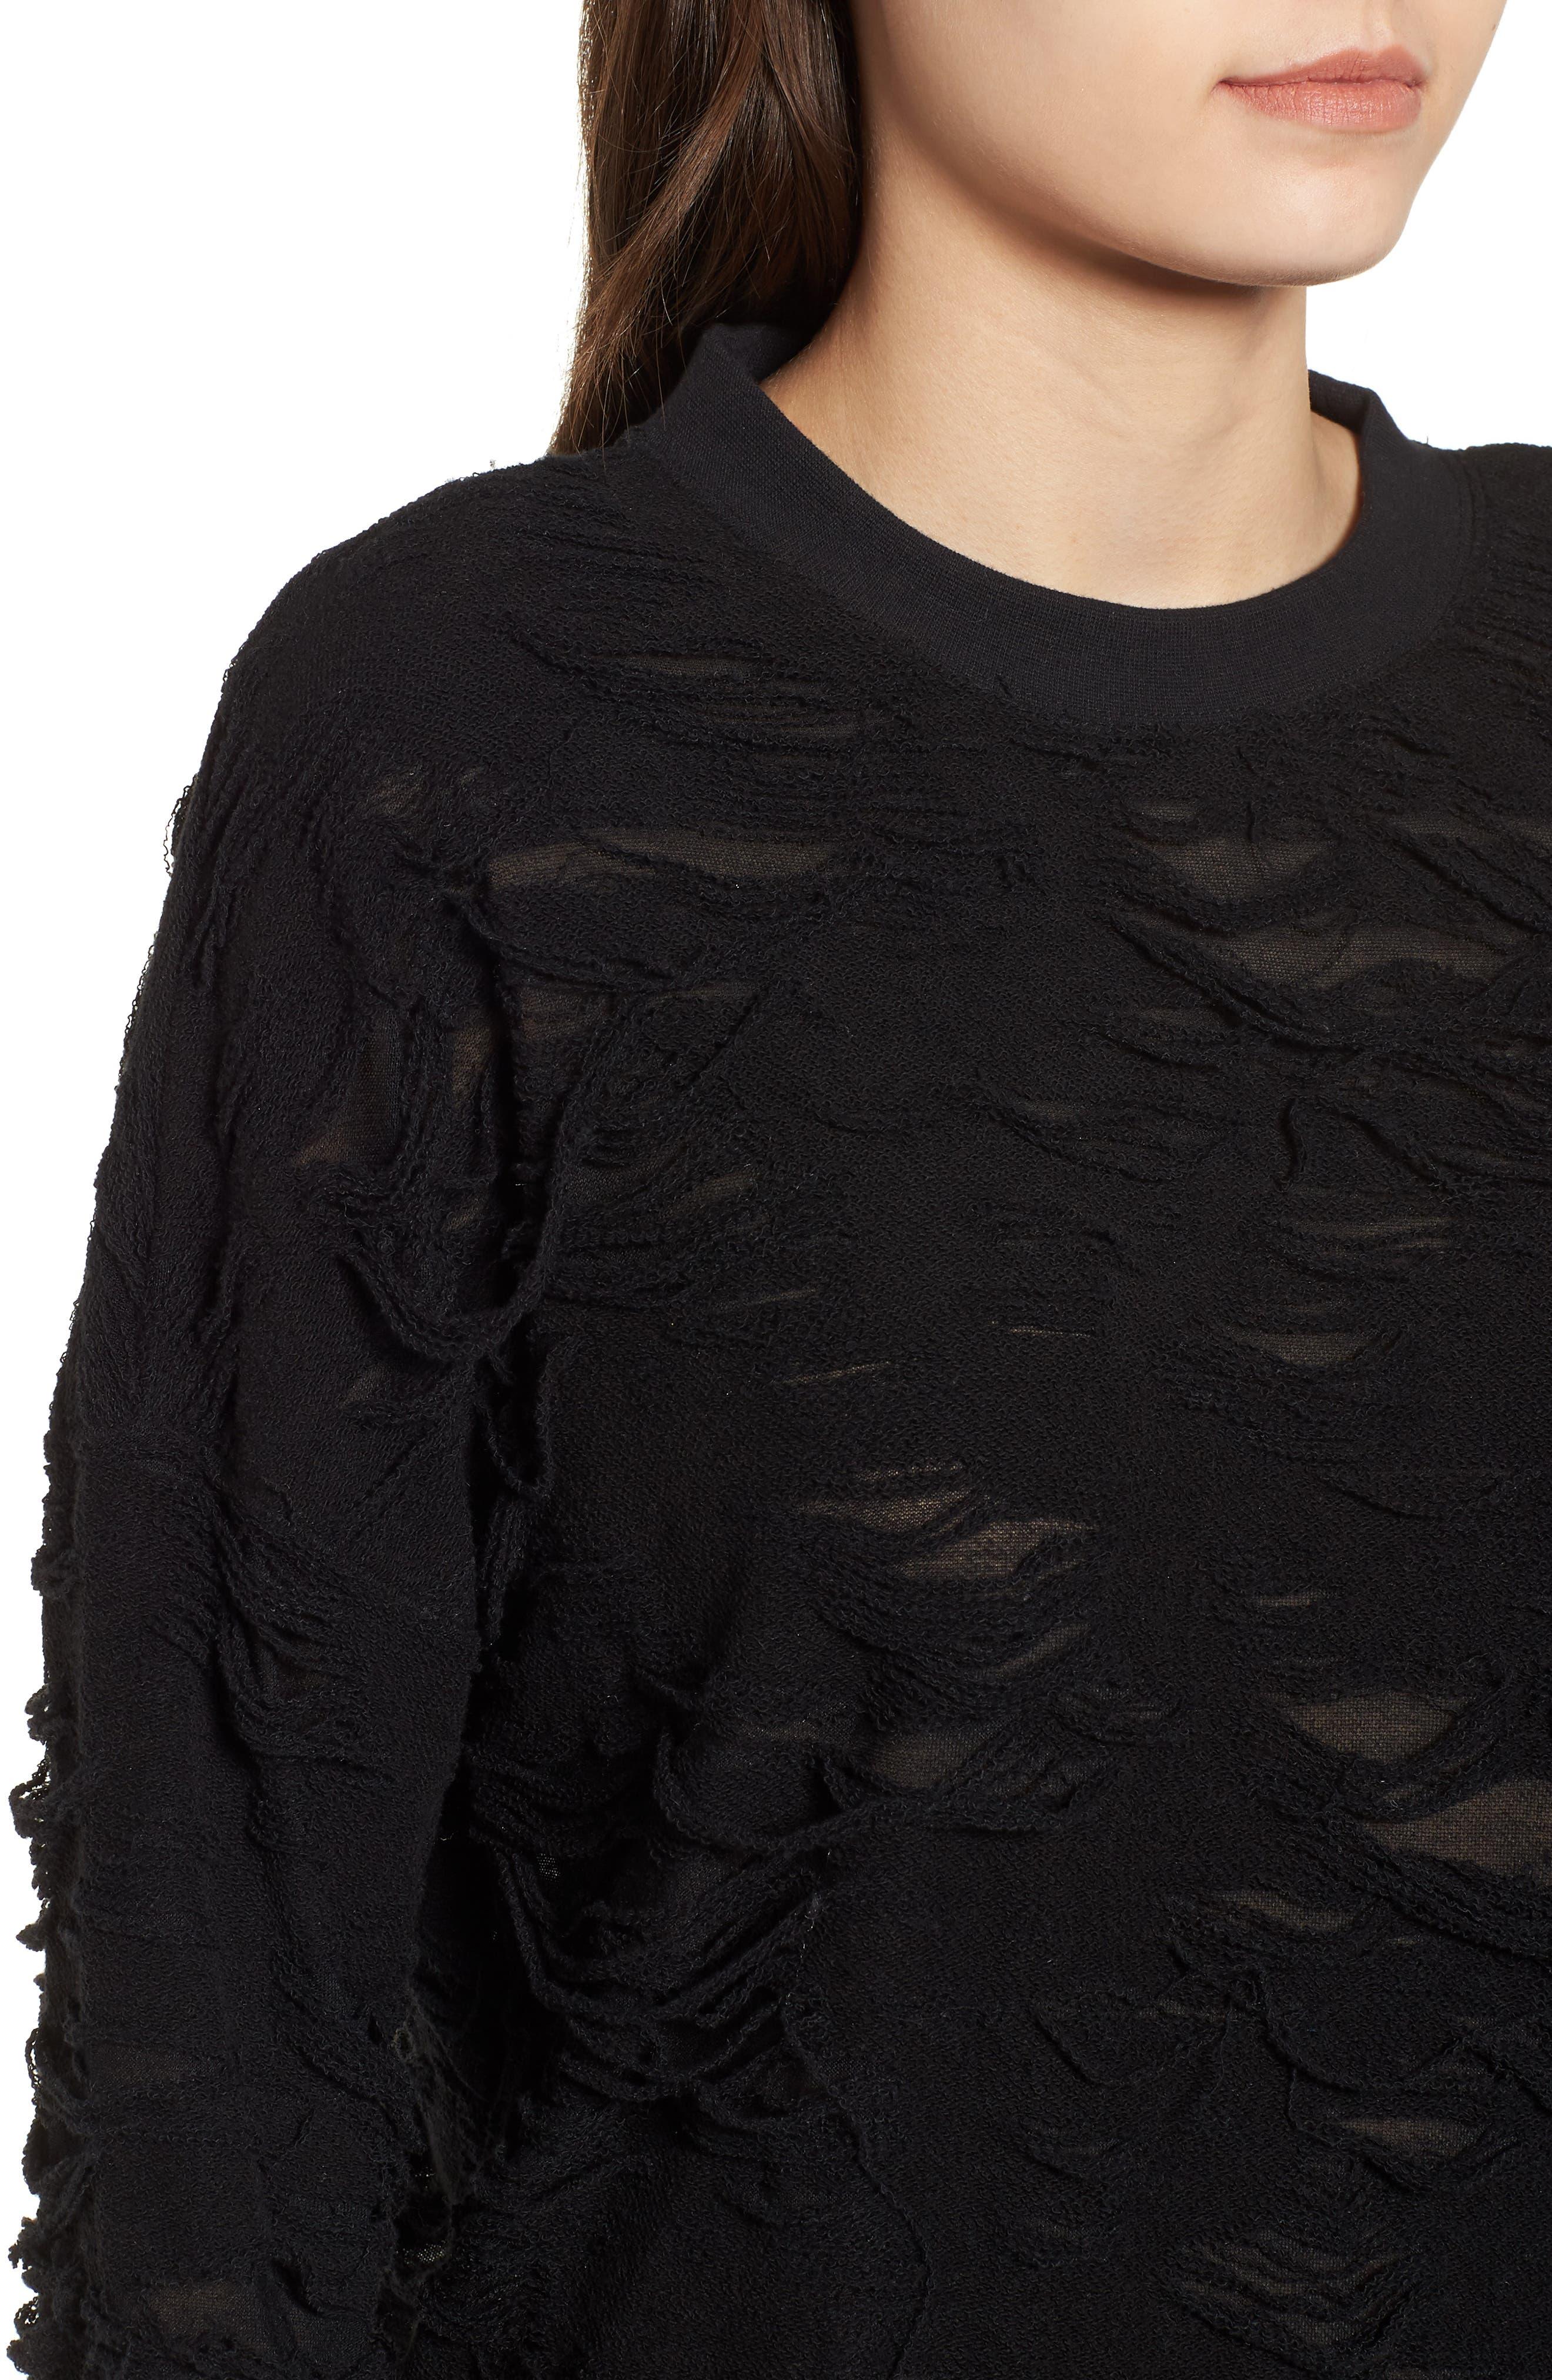 Me Too Slashed Sweatshirt,                             Alternate thumbnail 4, color,                             001